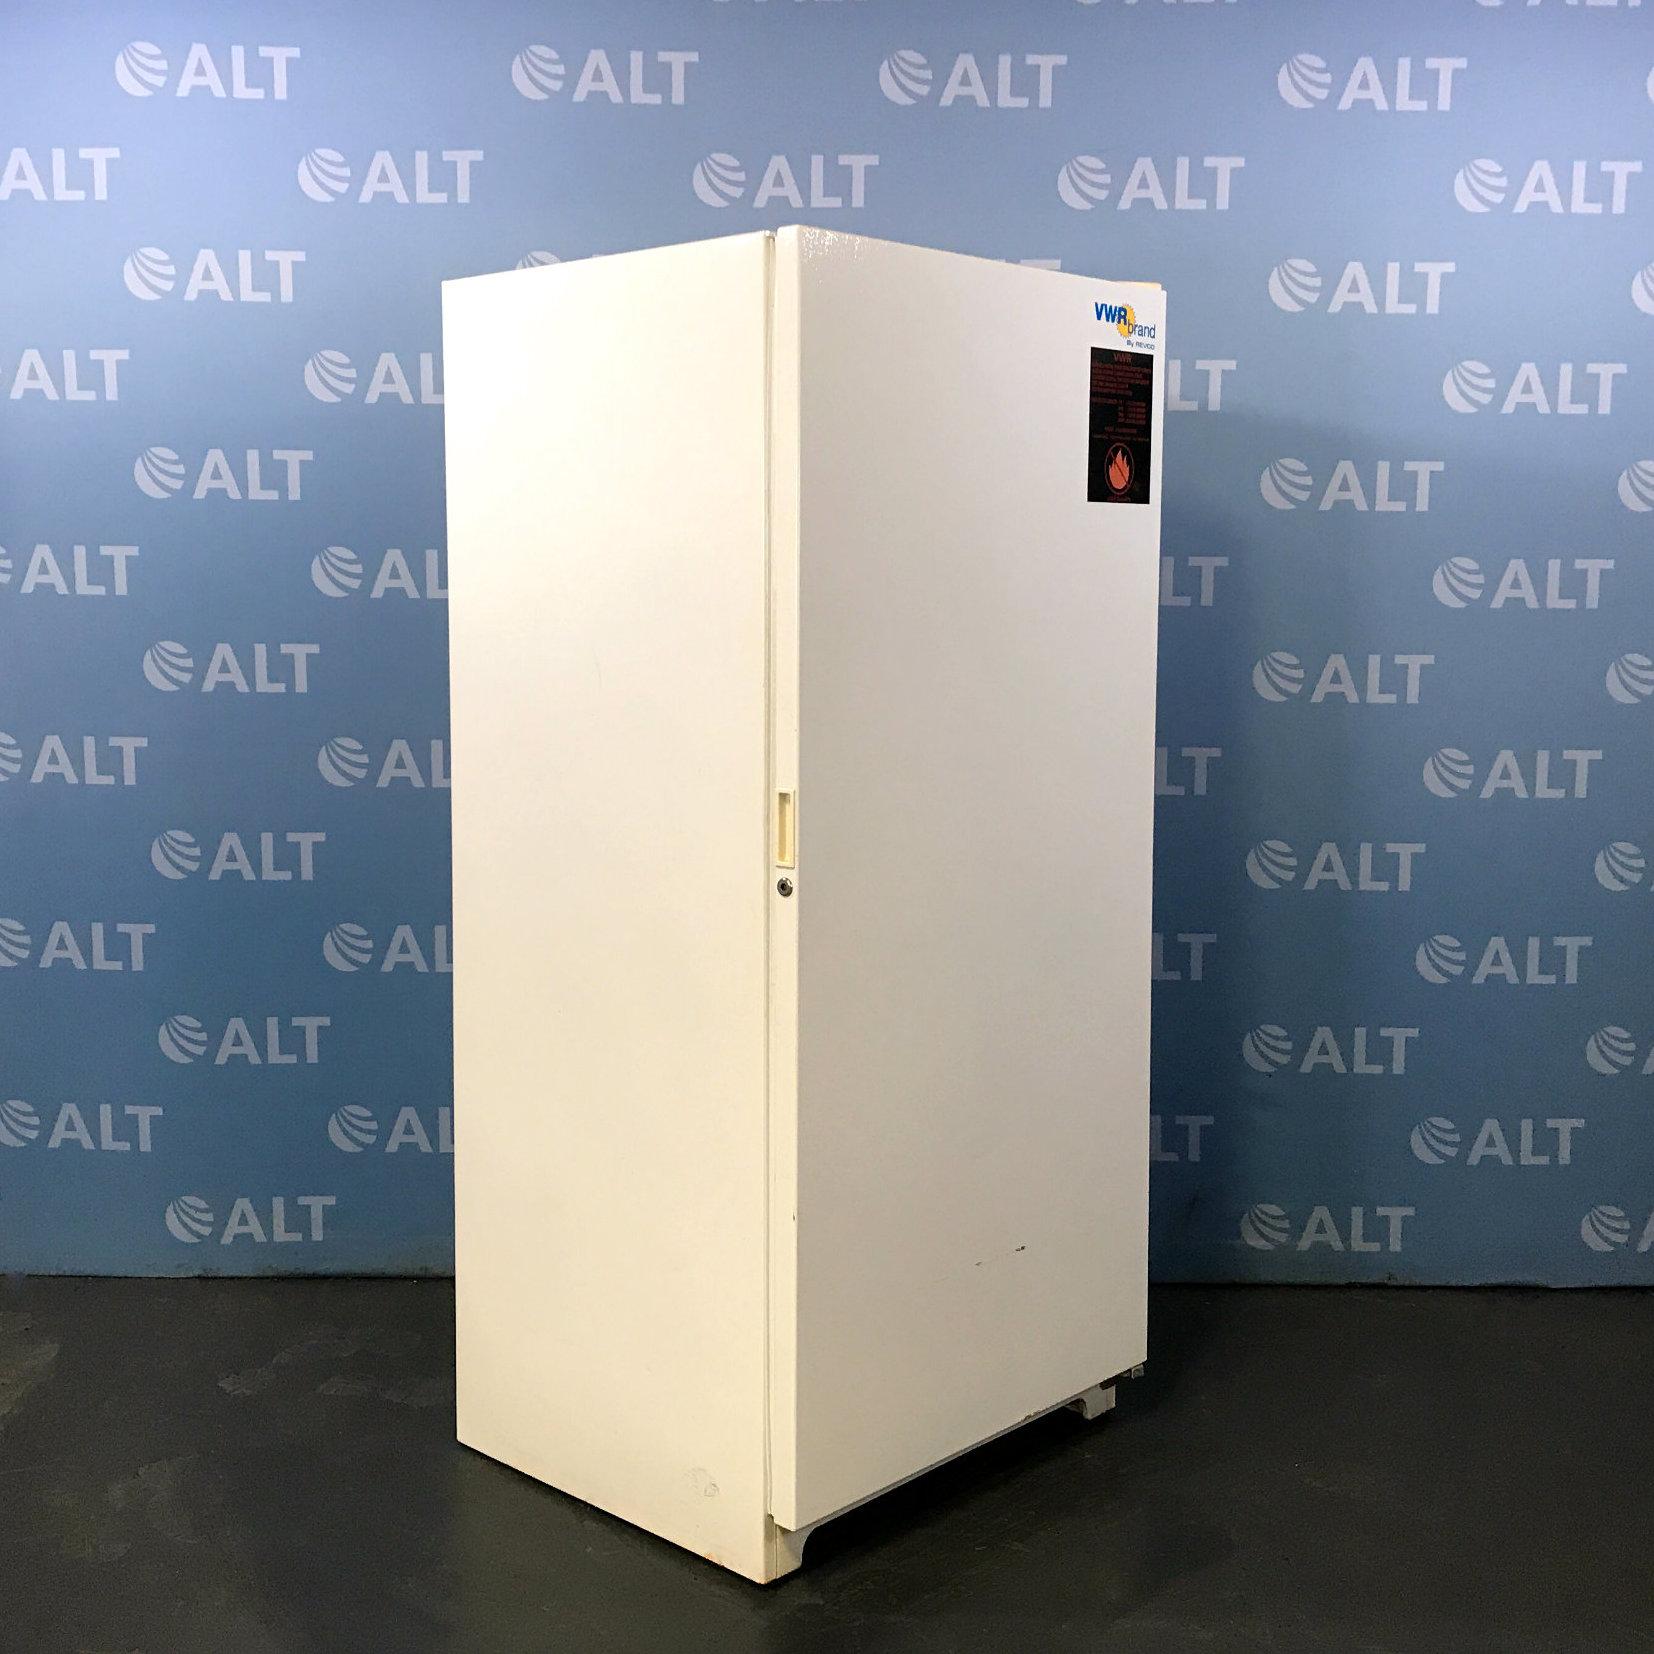 VWR R421FA14 -20 Flammable Storage Freezer  Image